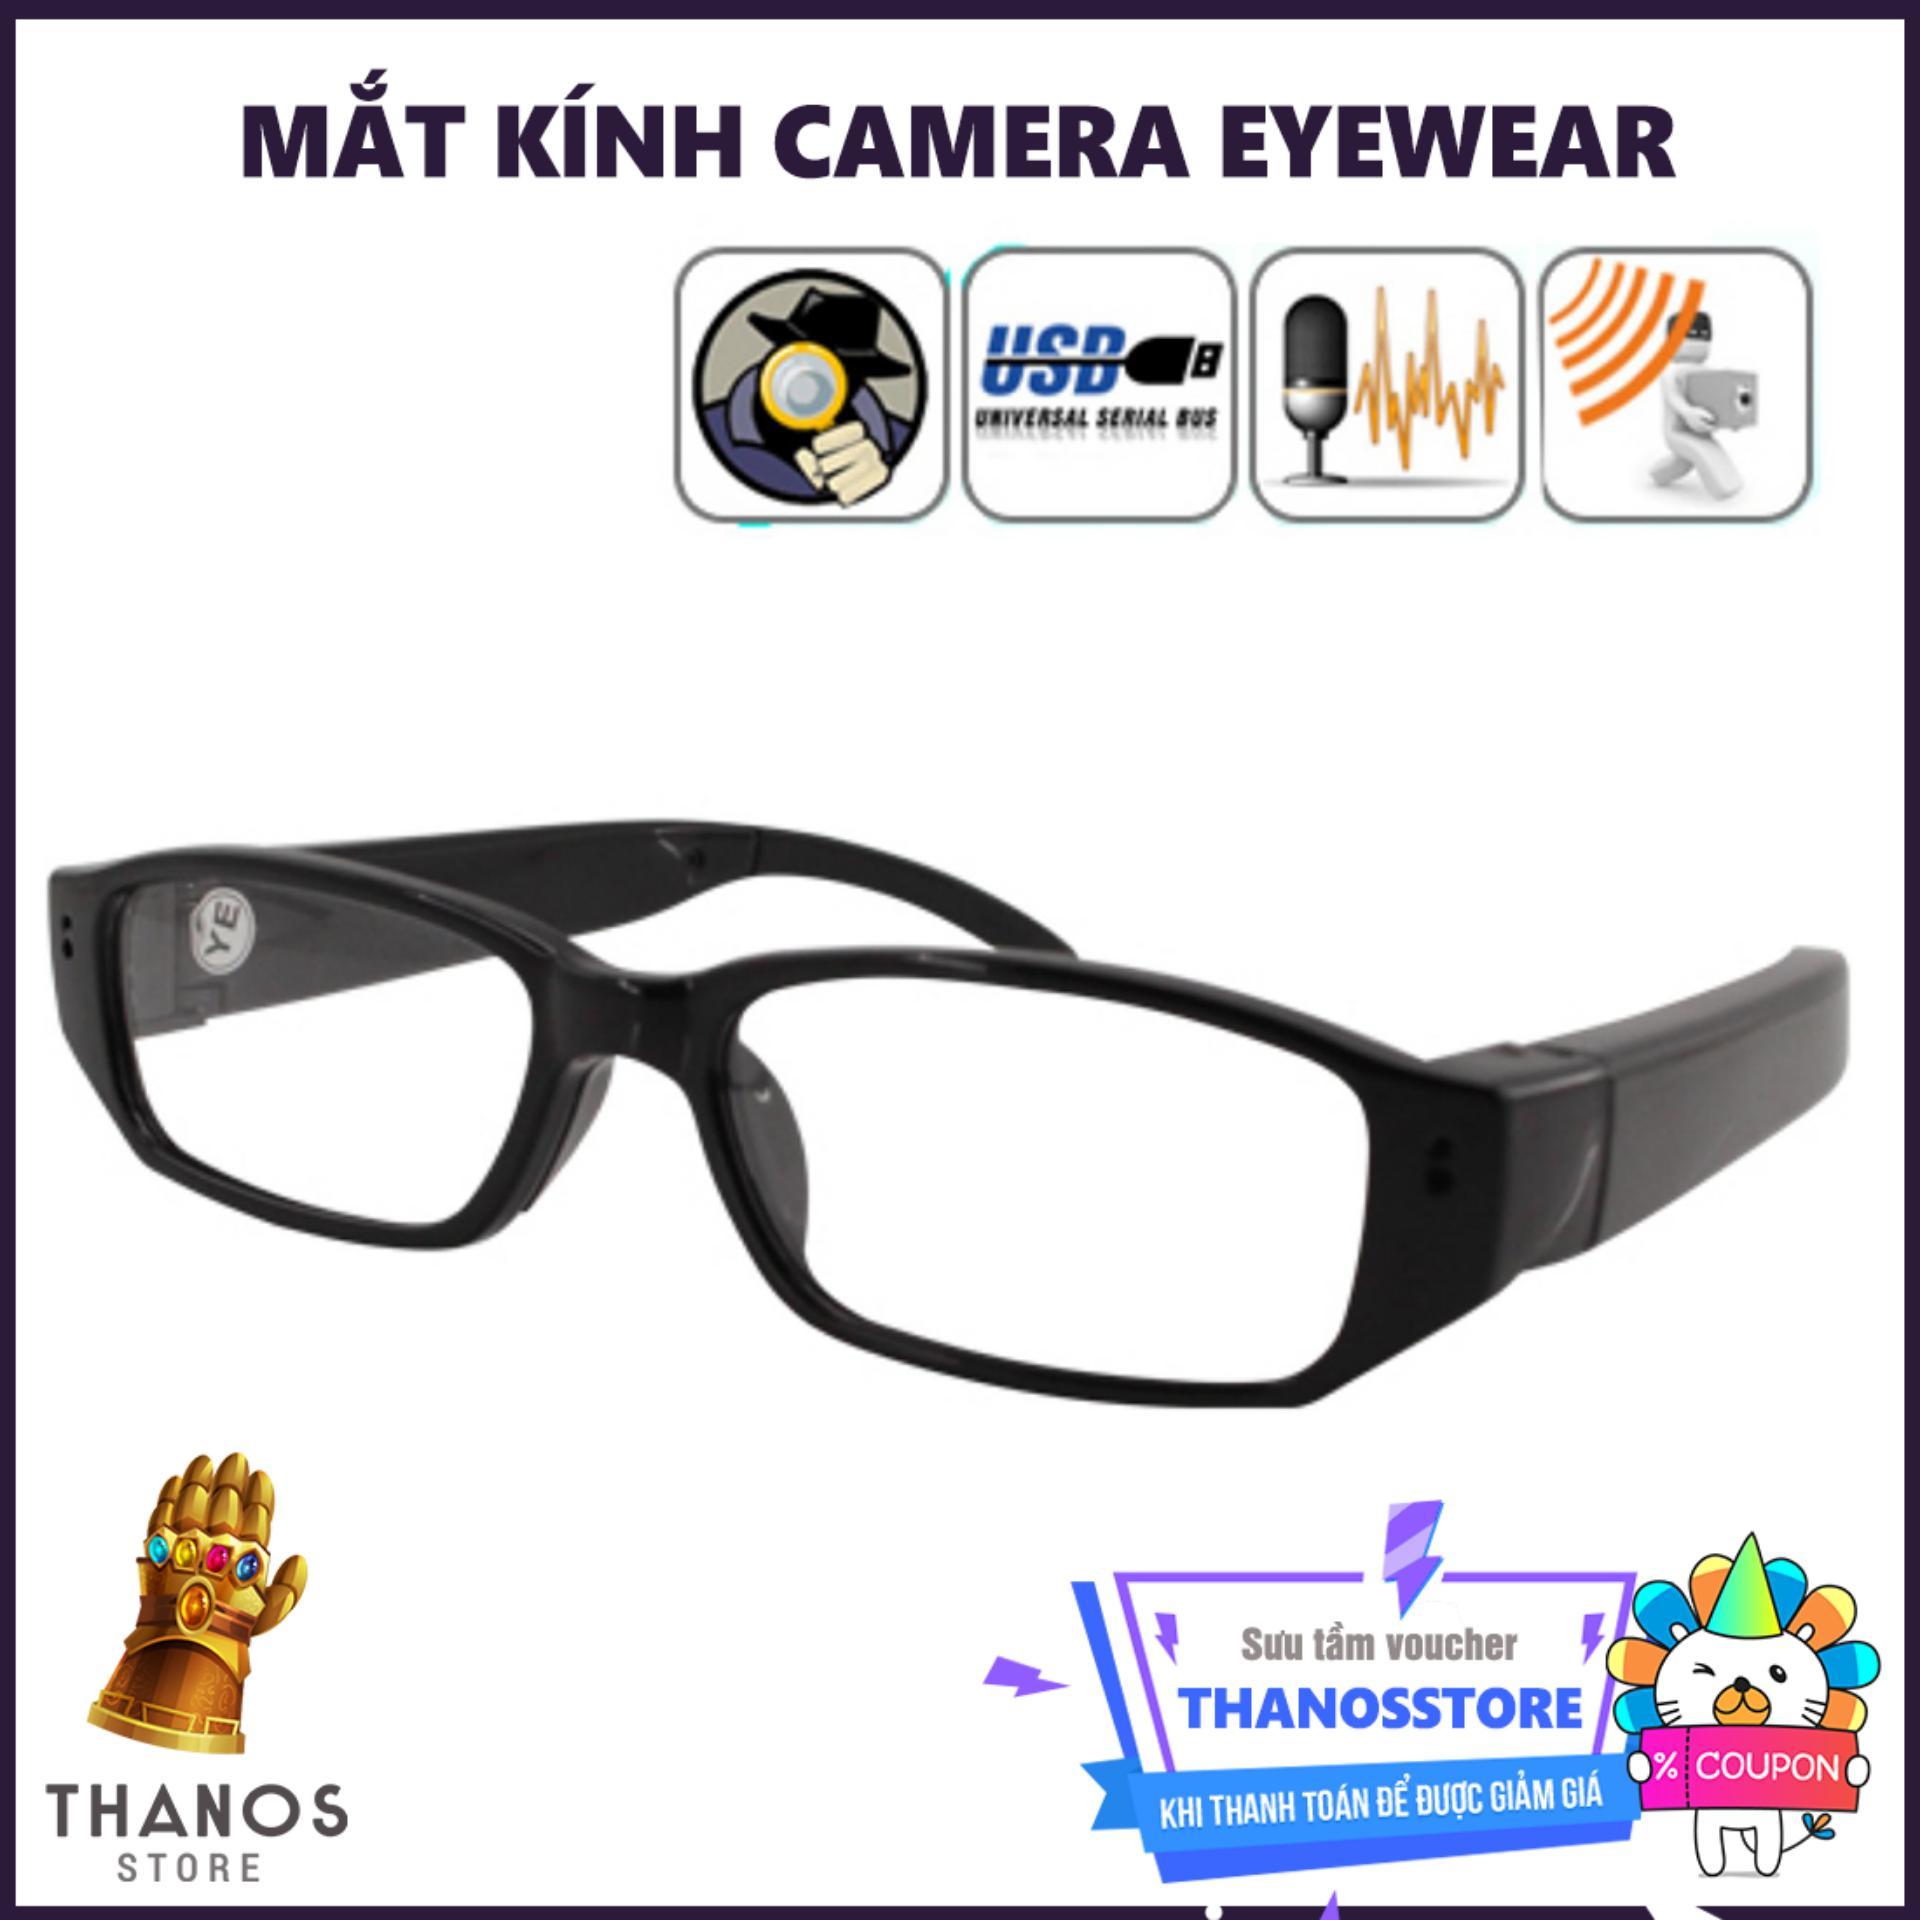 Mắt kính Camera Eyewear - Thanos Store